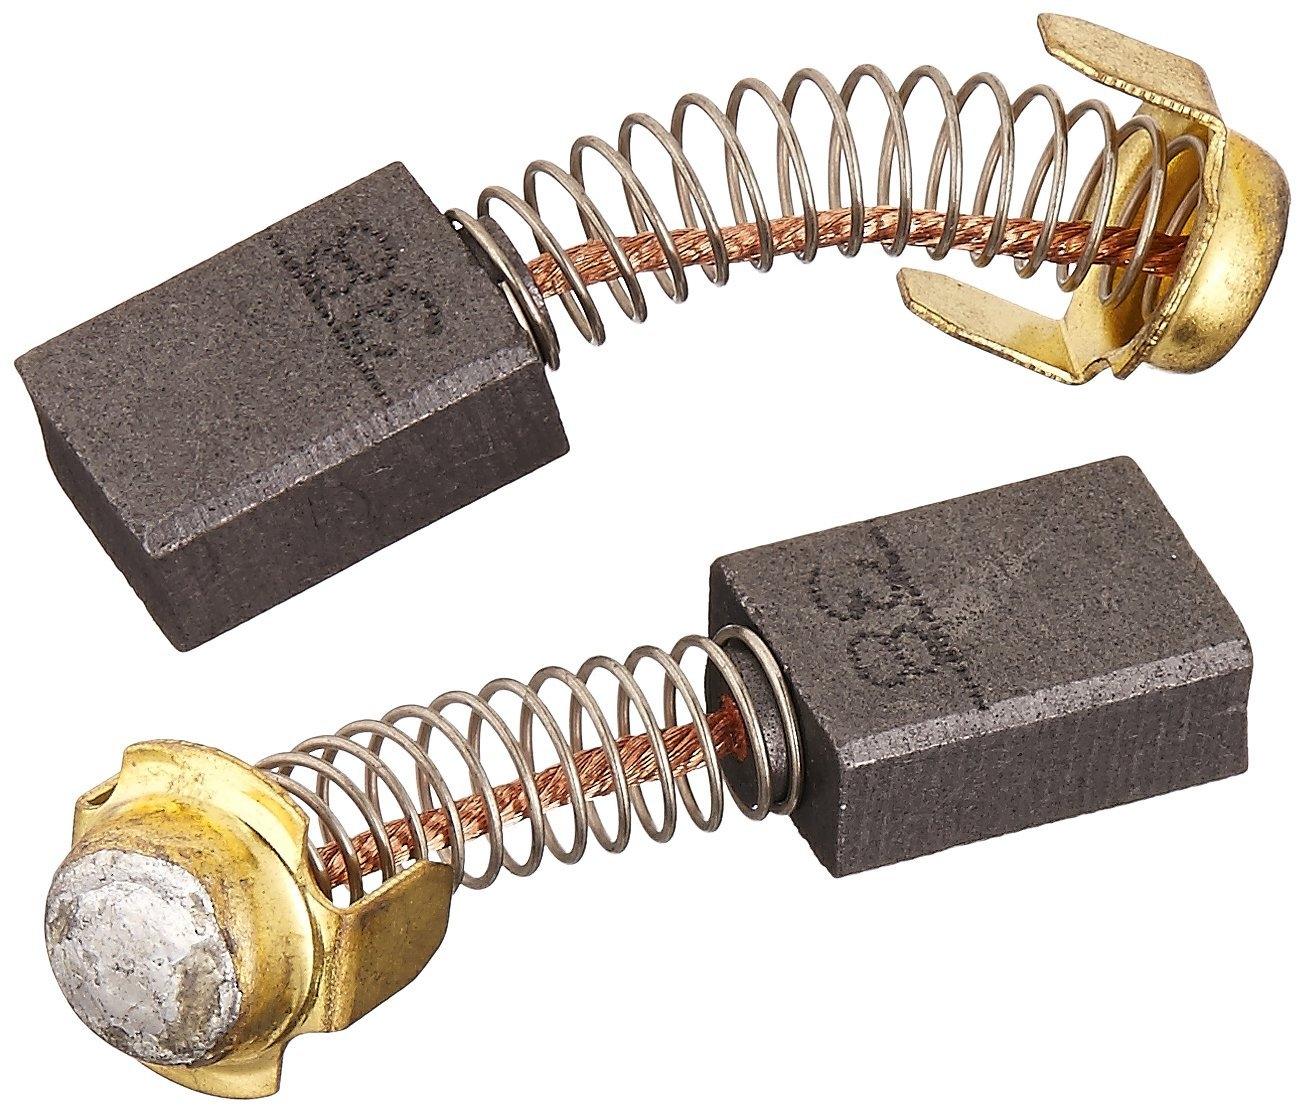 Charbon Balais pour Hitachi 999021 g10sr2 Nº 109 g10ss-pas cher de rechange d10yb